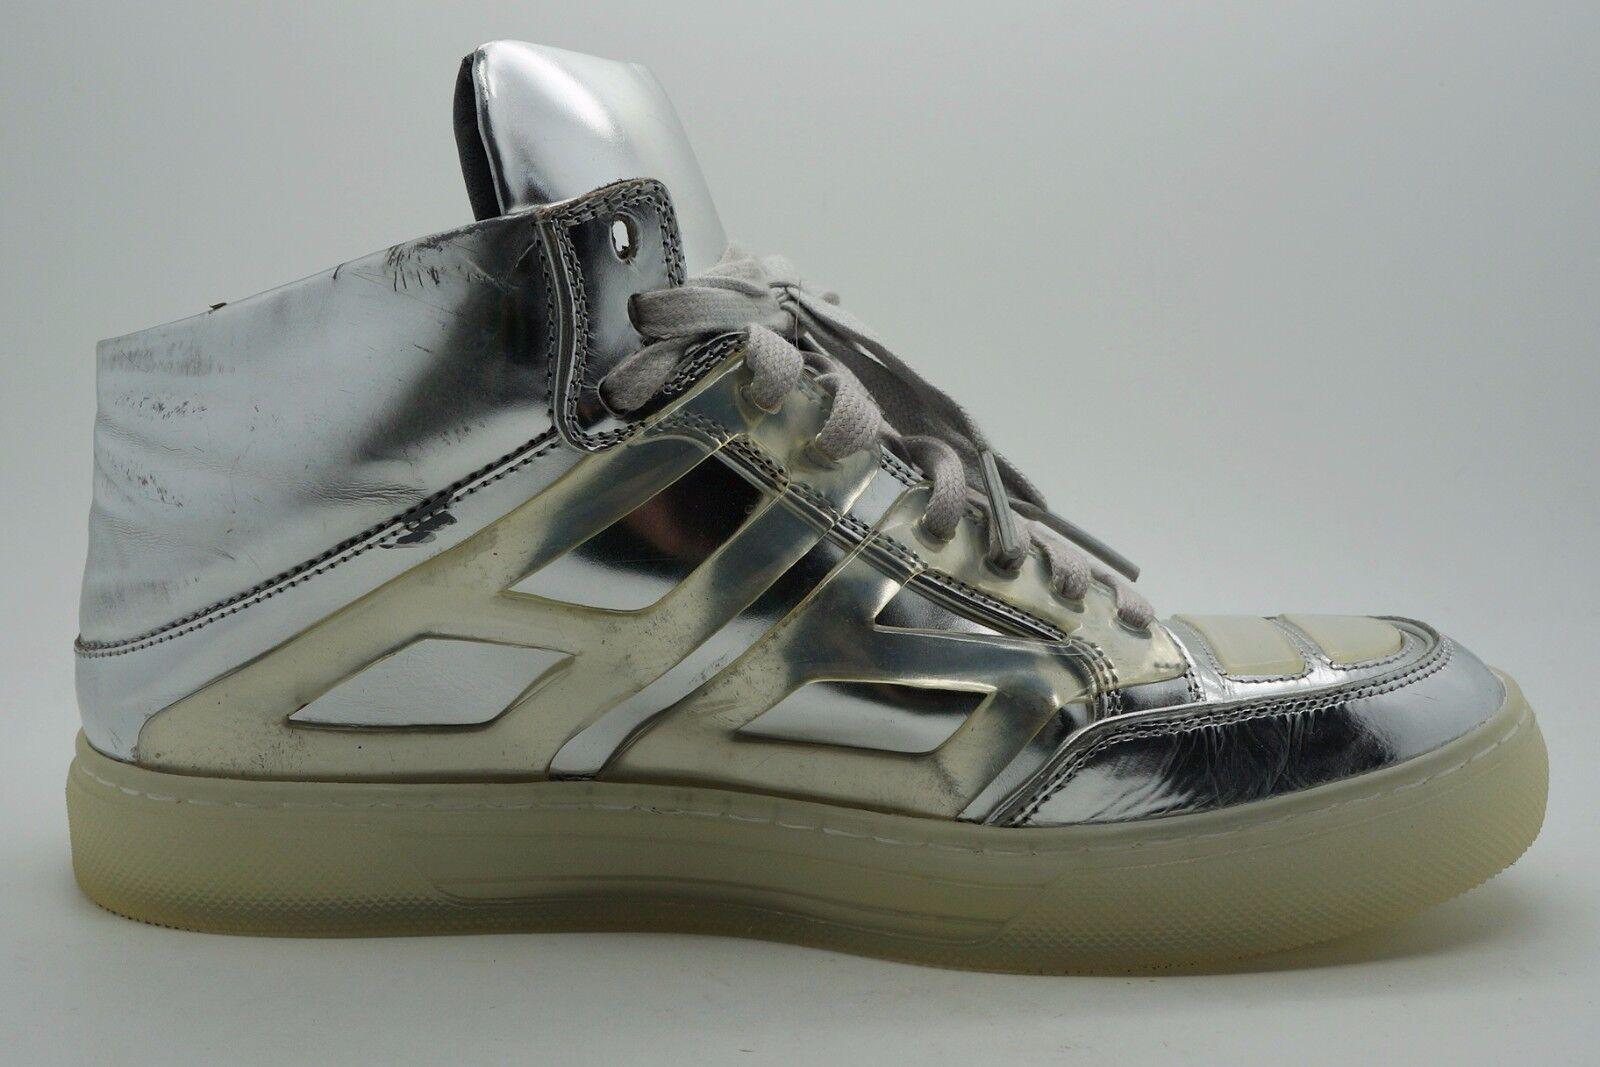 Alejandro Ingelmo Silber Metallic 7 Tron Sneakers Damen - Größe 7 Metallic B f50a3e